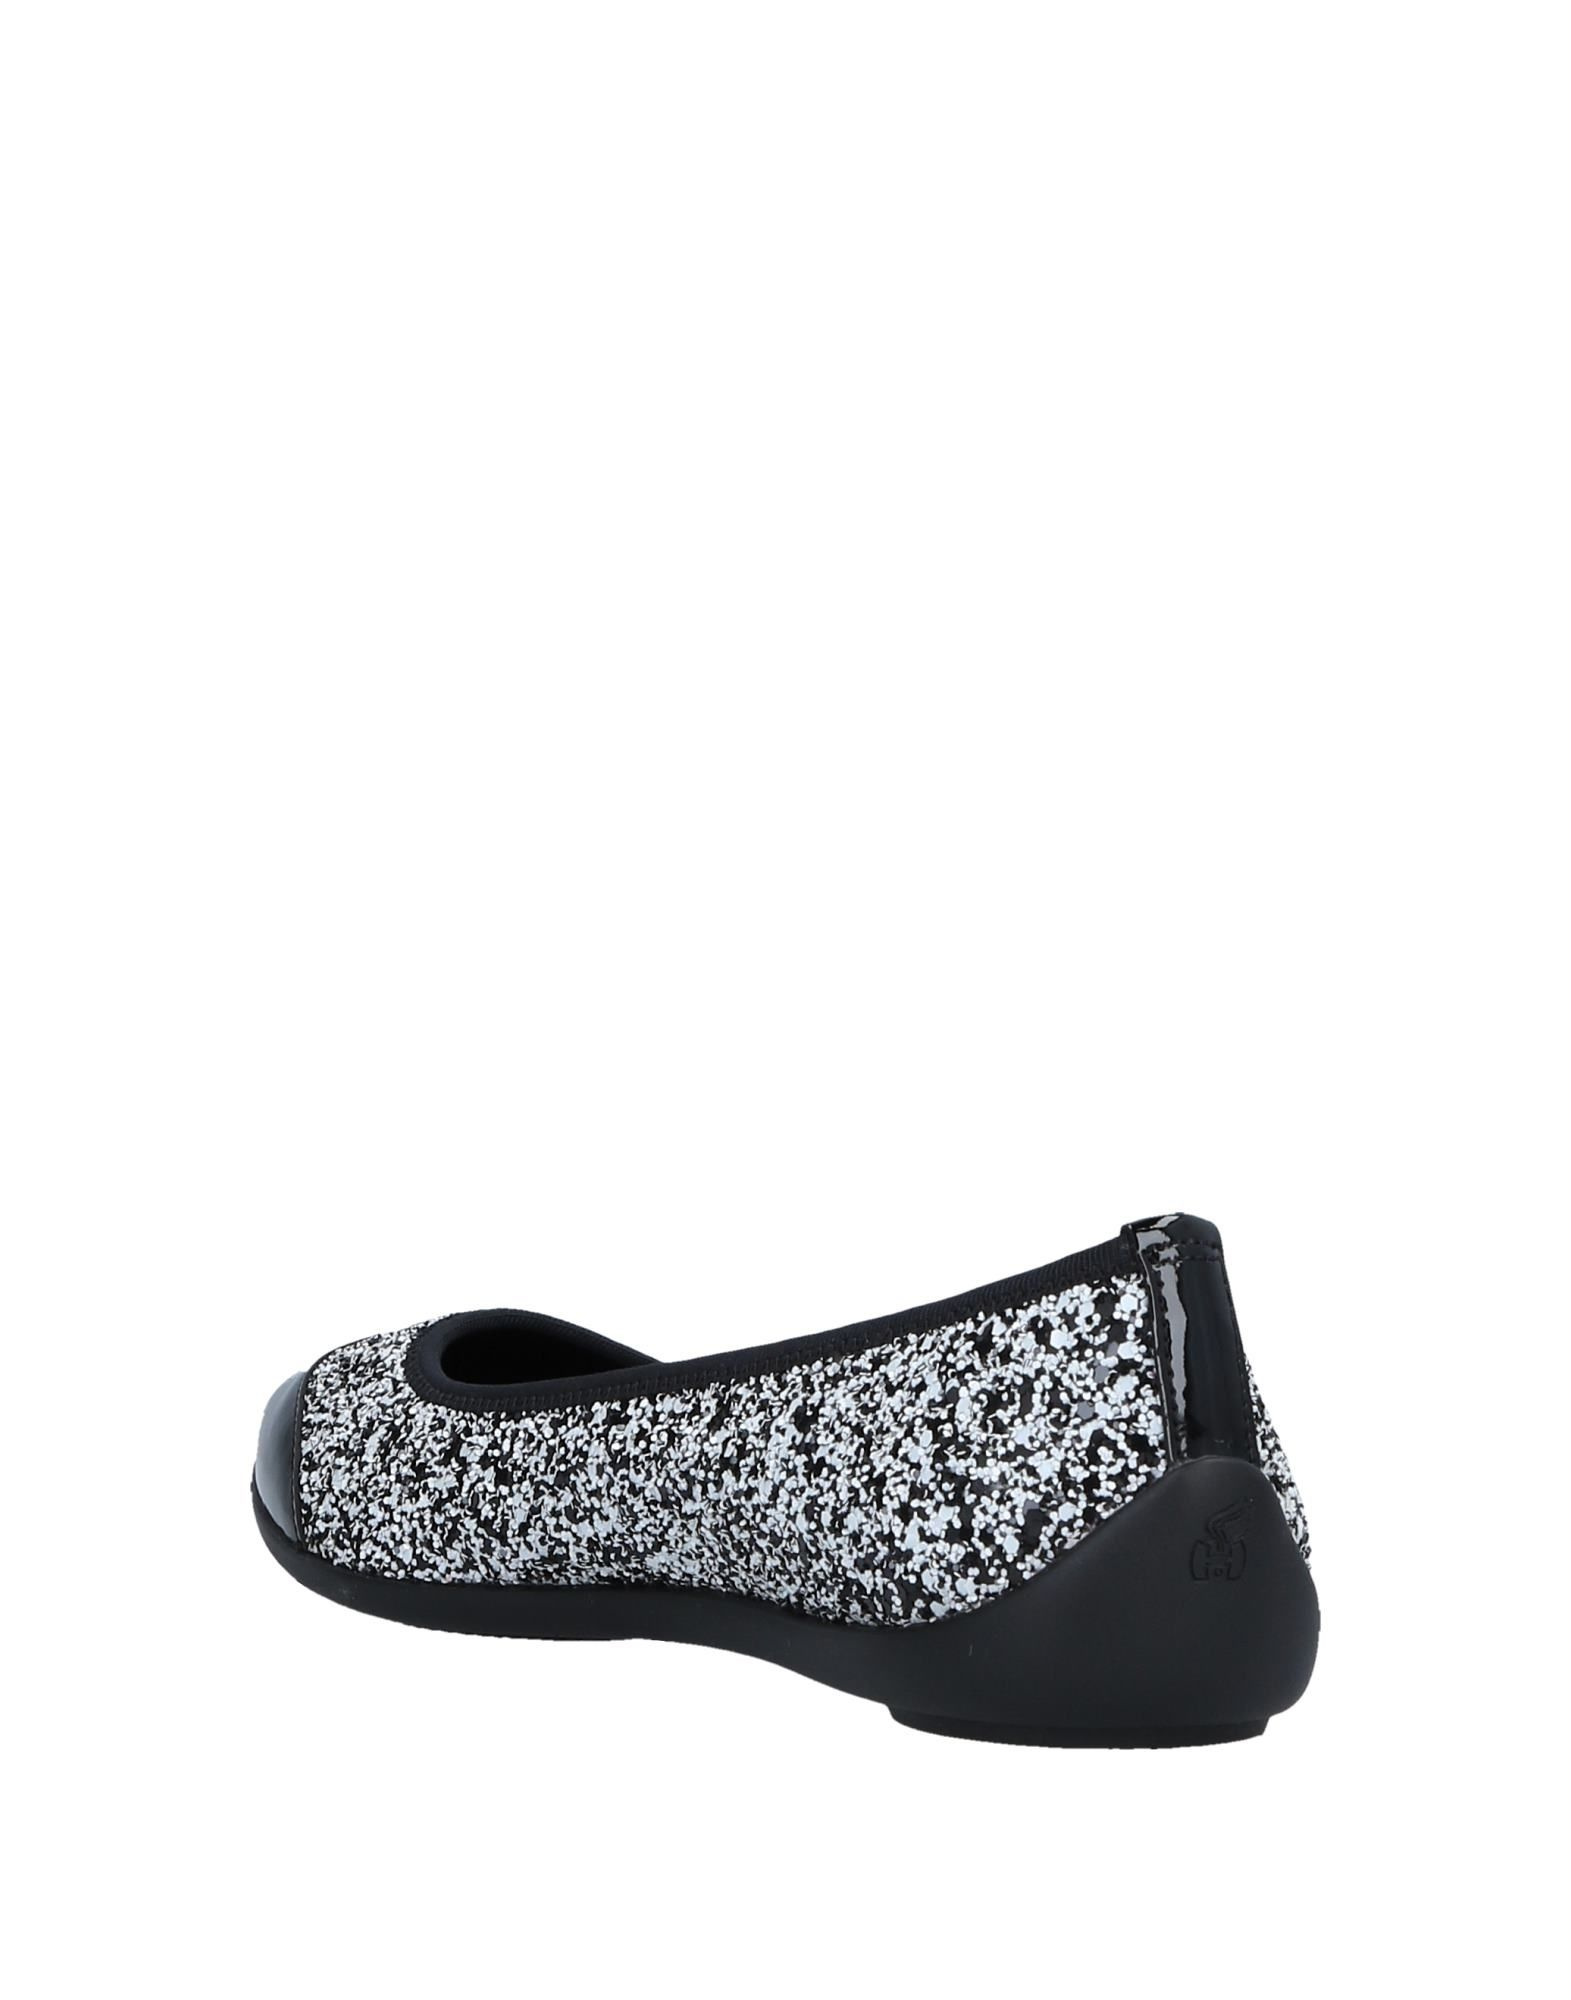 Hogan Ballerinas Damen  11540048HWGut Schuhe aussehende strapazierfähige Schuhe 11540048HWGut 469416